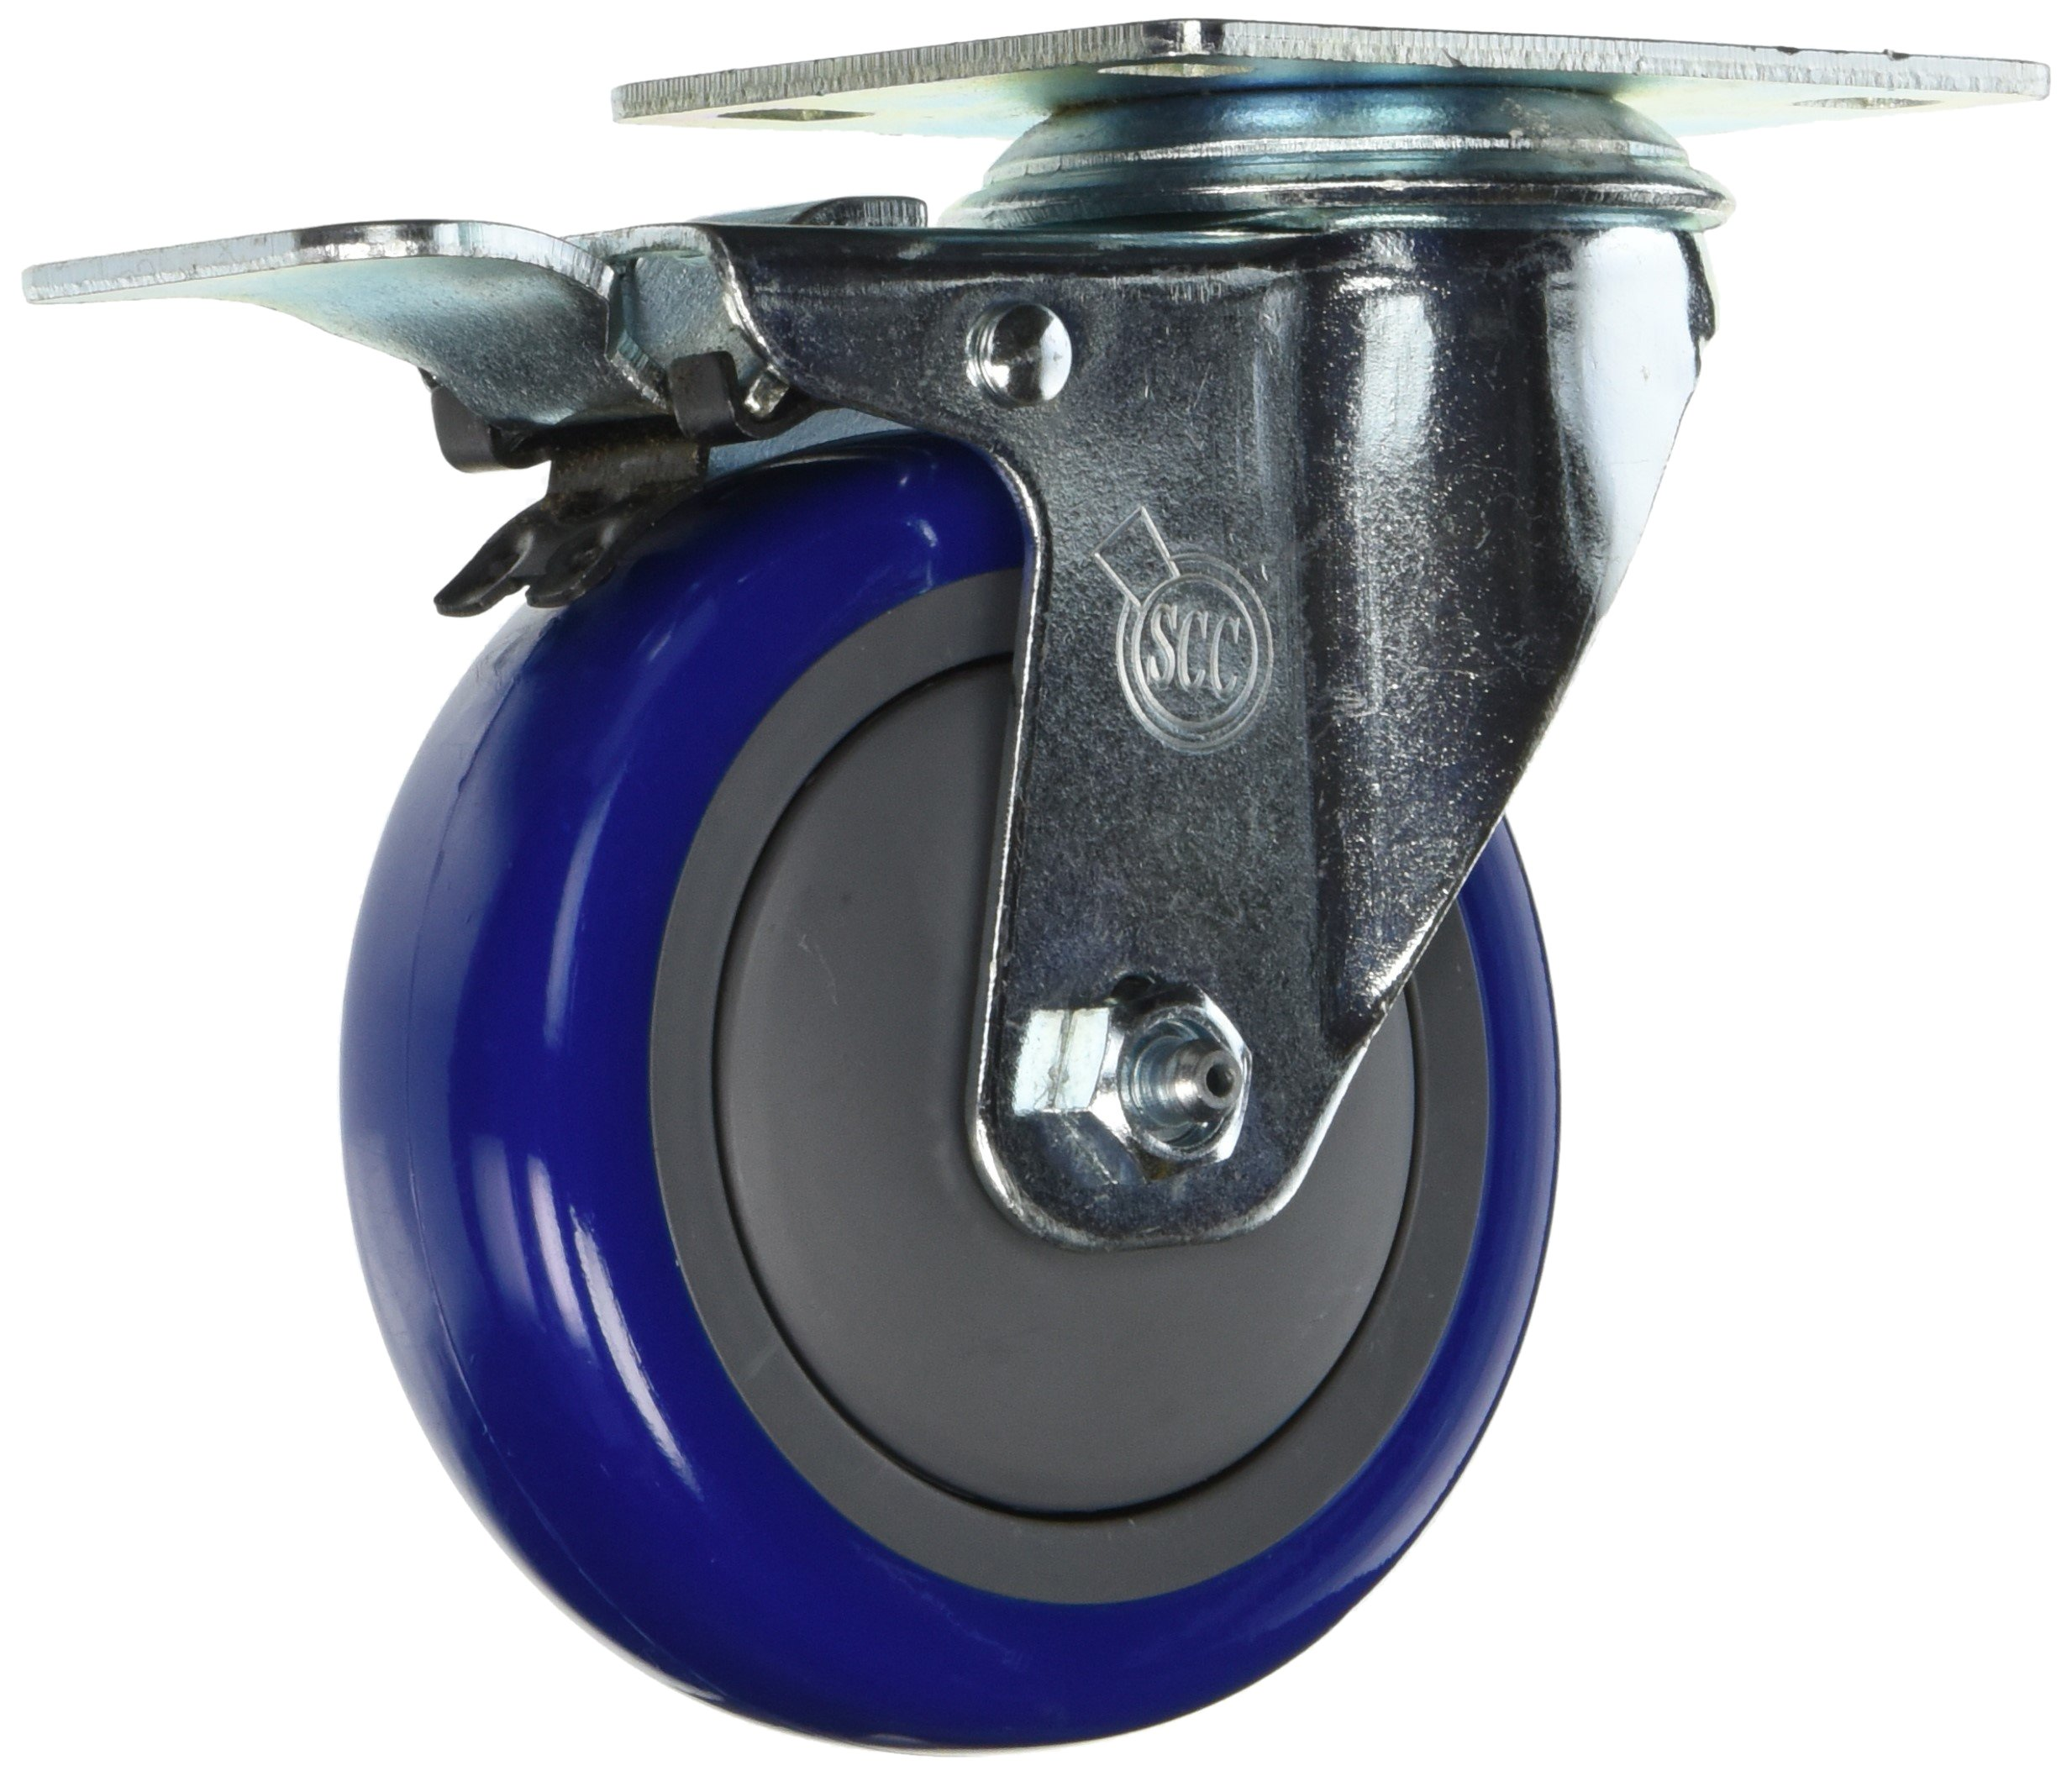 Service Caster SCC-TTL20S414-PPUB-BLUE-4 Swivel Caster Total Lock Brake, Blue Polyurethane Tread, Top Plate, 4'' Size (Pack of 4)